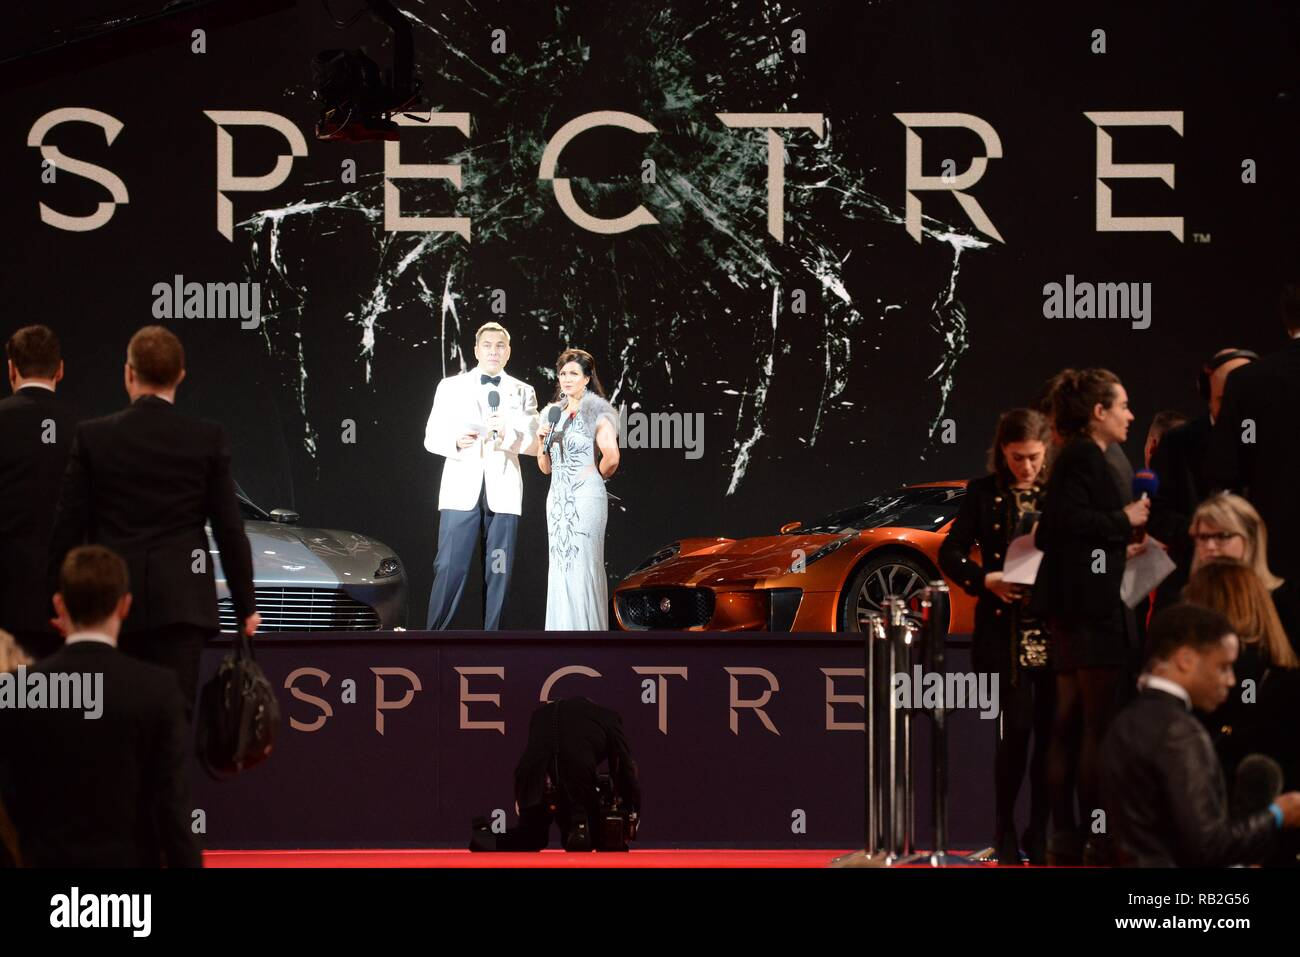 Celebrities arrive at the Royal Albert Hall in Kensington, London for the premiere of Spectre  Where: London, United Kingdom When: 26 Oct 2015 Credit: Steve Finn/WENN - Stock Image